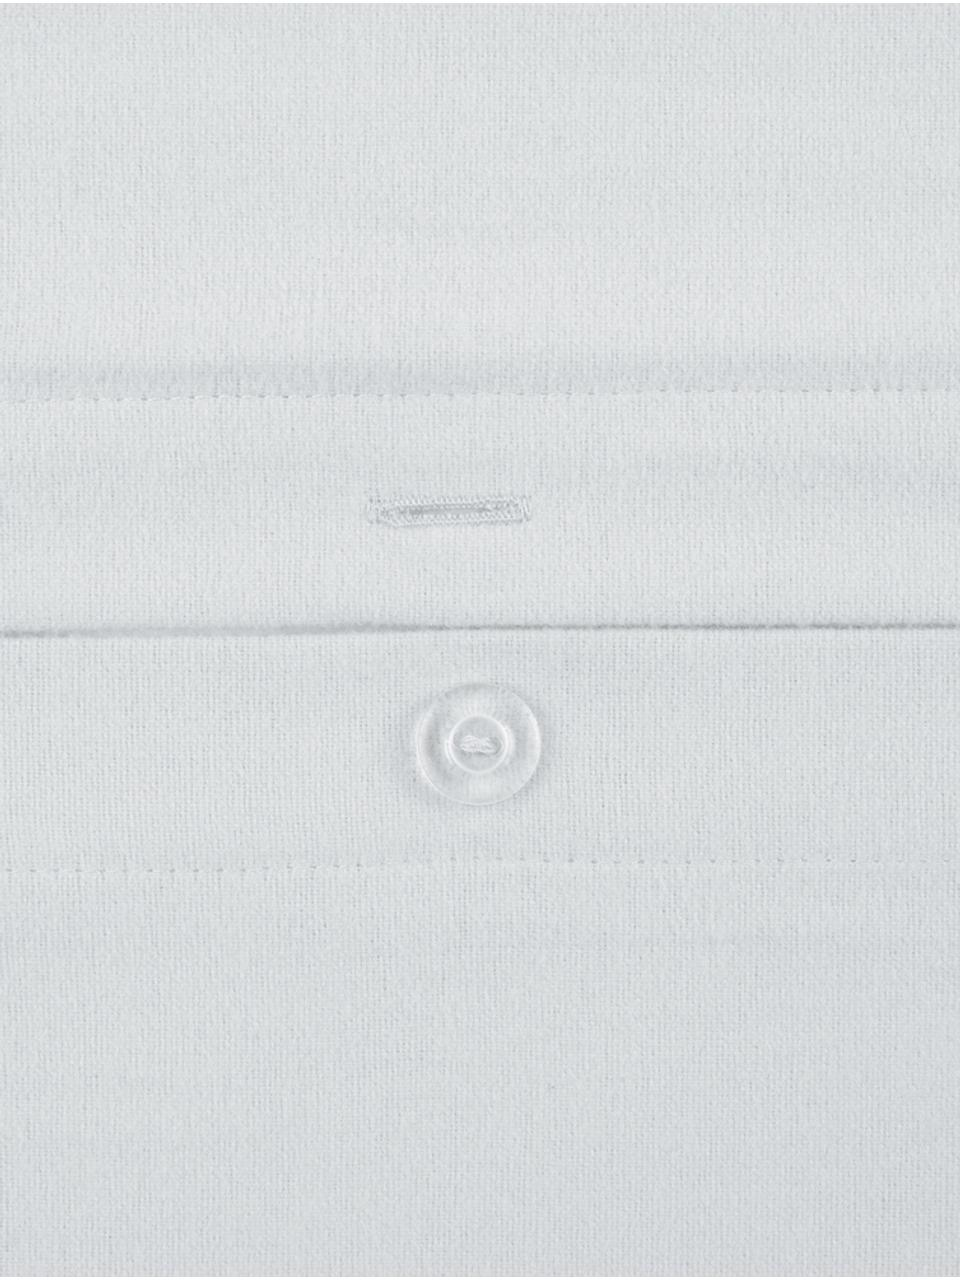 Flanell-Kissenbezüge Biba in Hellgrau, 2 Stück, Webart: Flanell Flanell ist ein k, Hellgrau, 40 x 80 cm